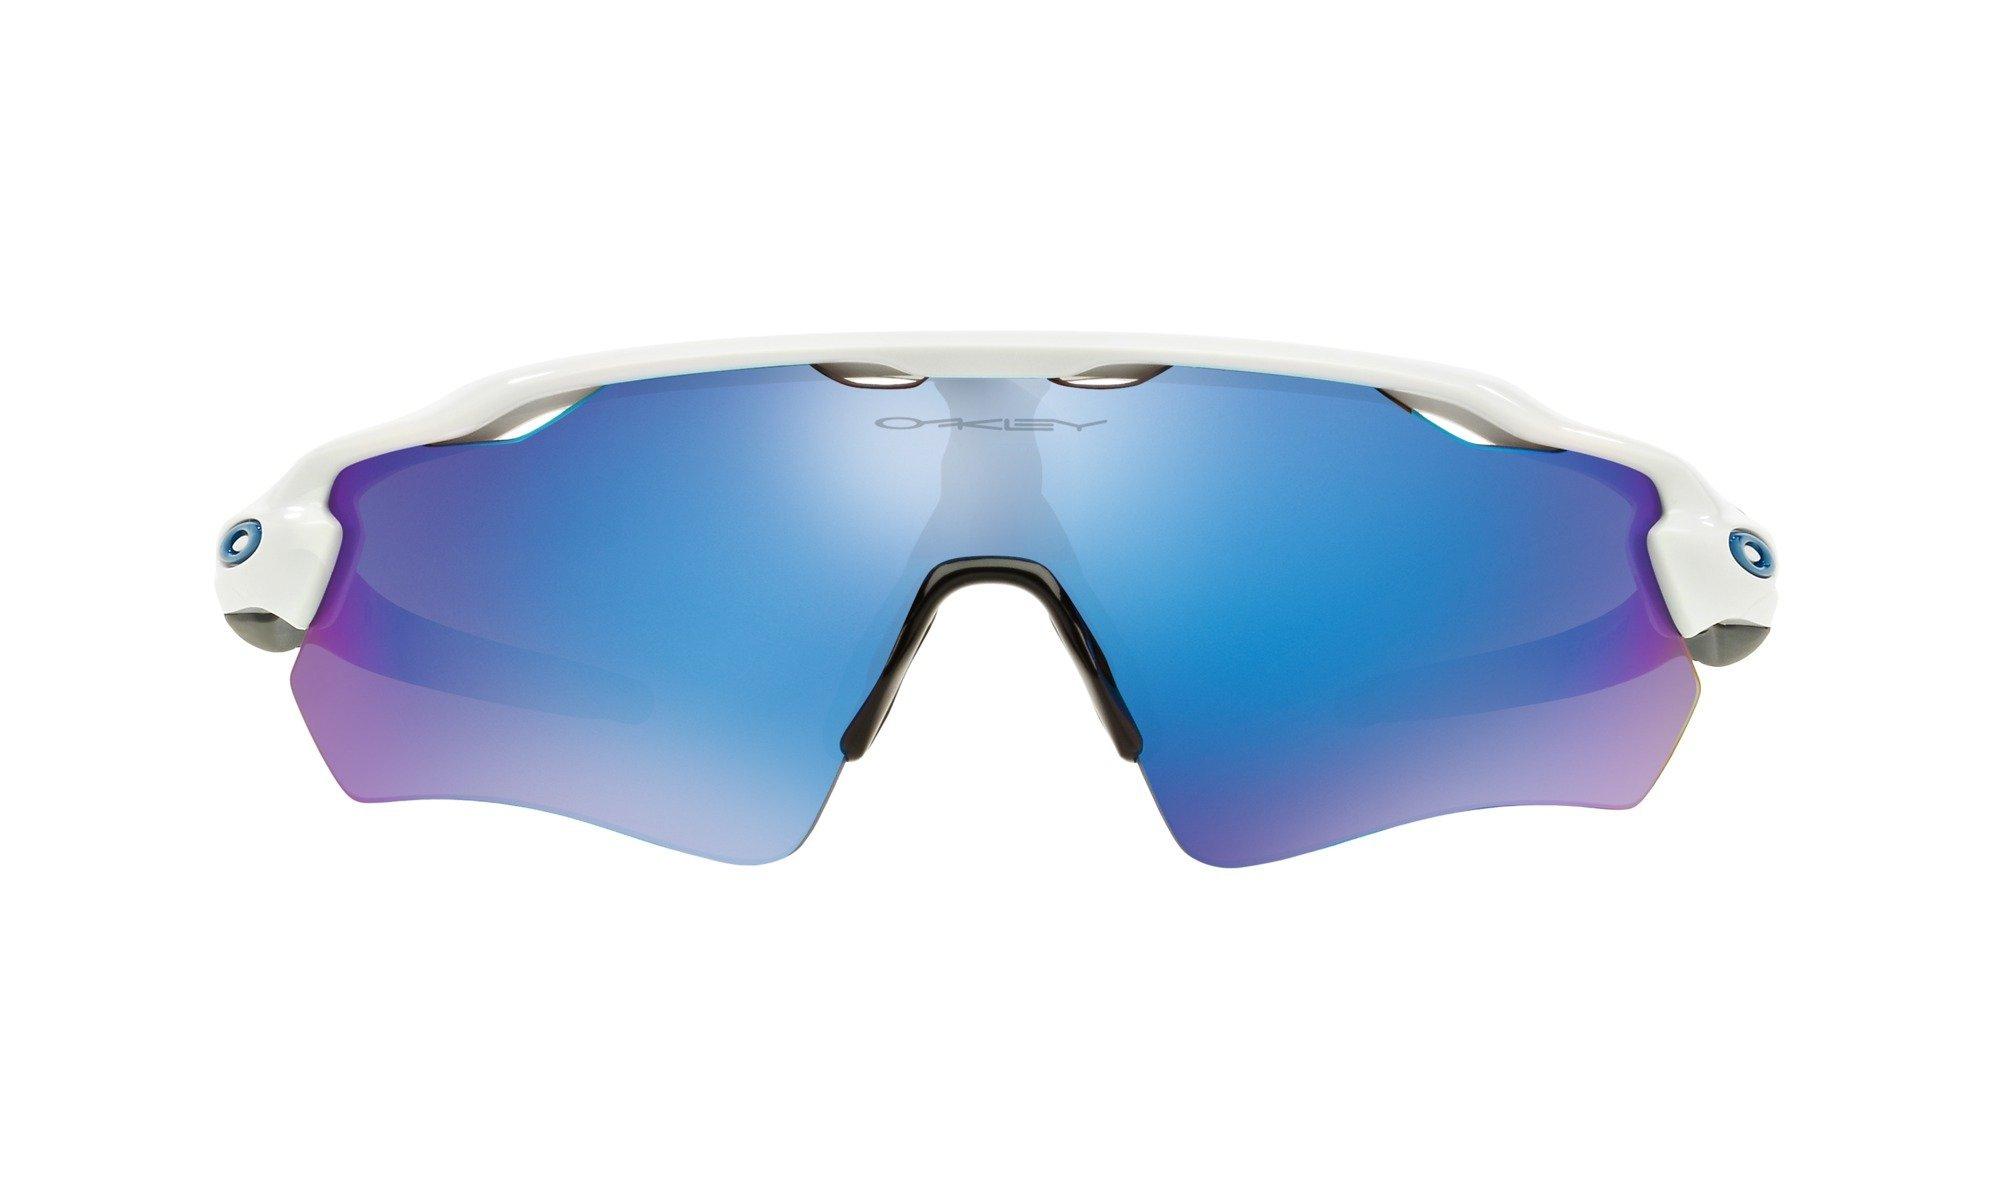 Oakley Men's Radar EV Path OO9208-17 Non-Polarized Iridium Shield Sunglasses, Polished White, 138 mm